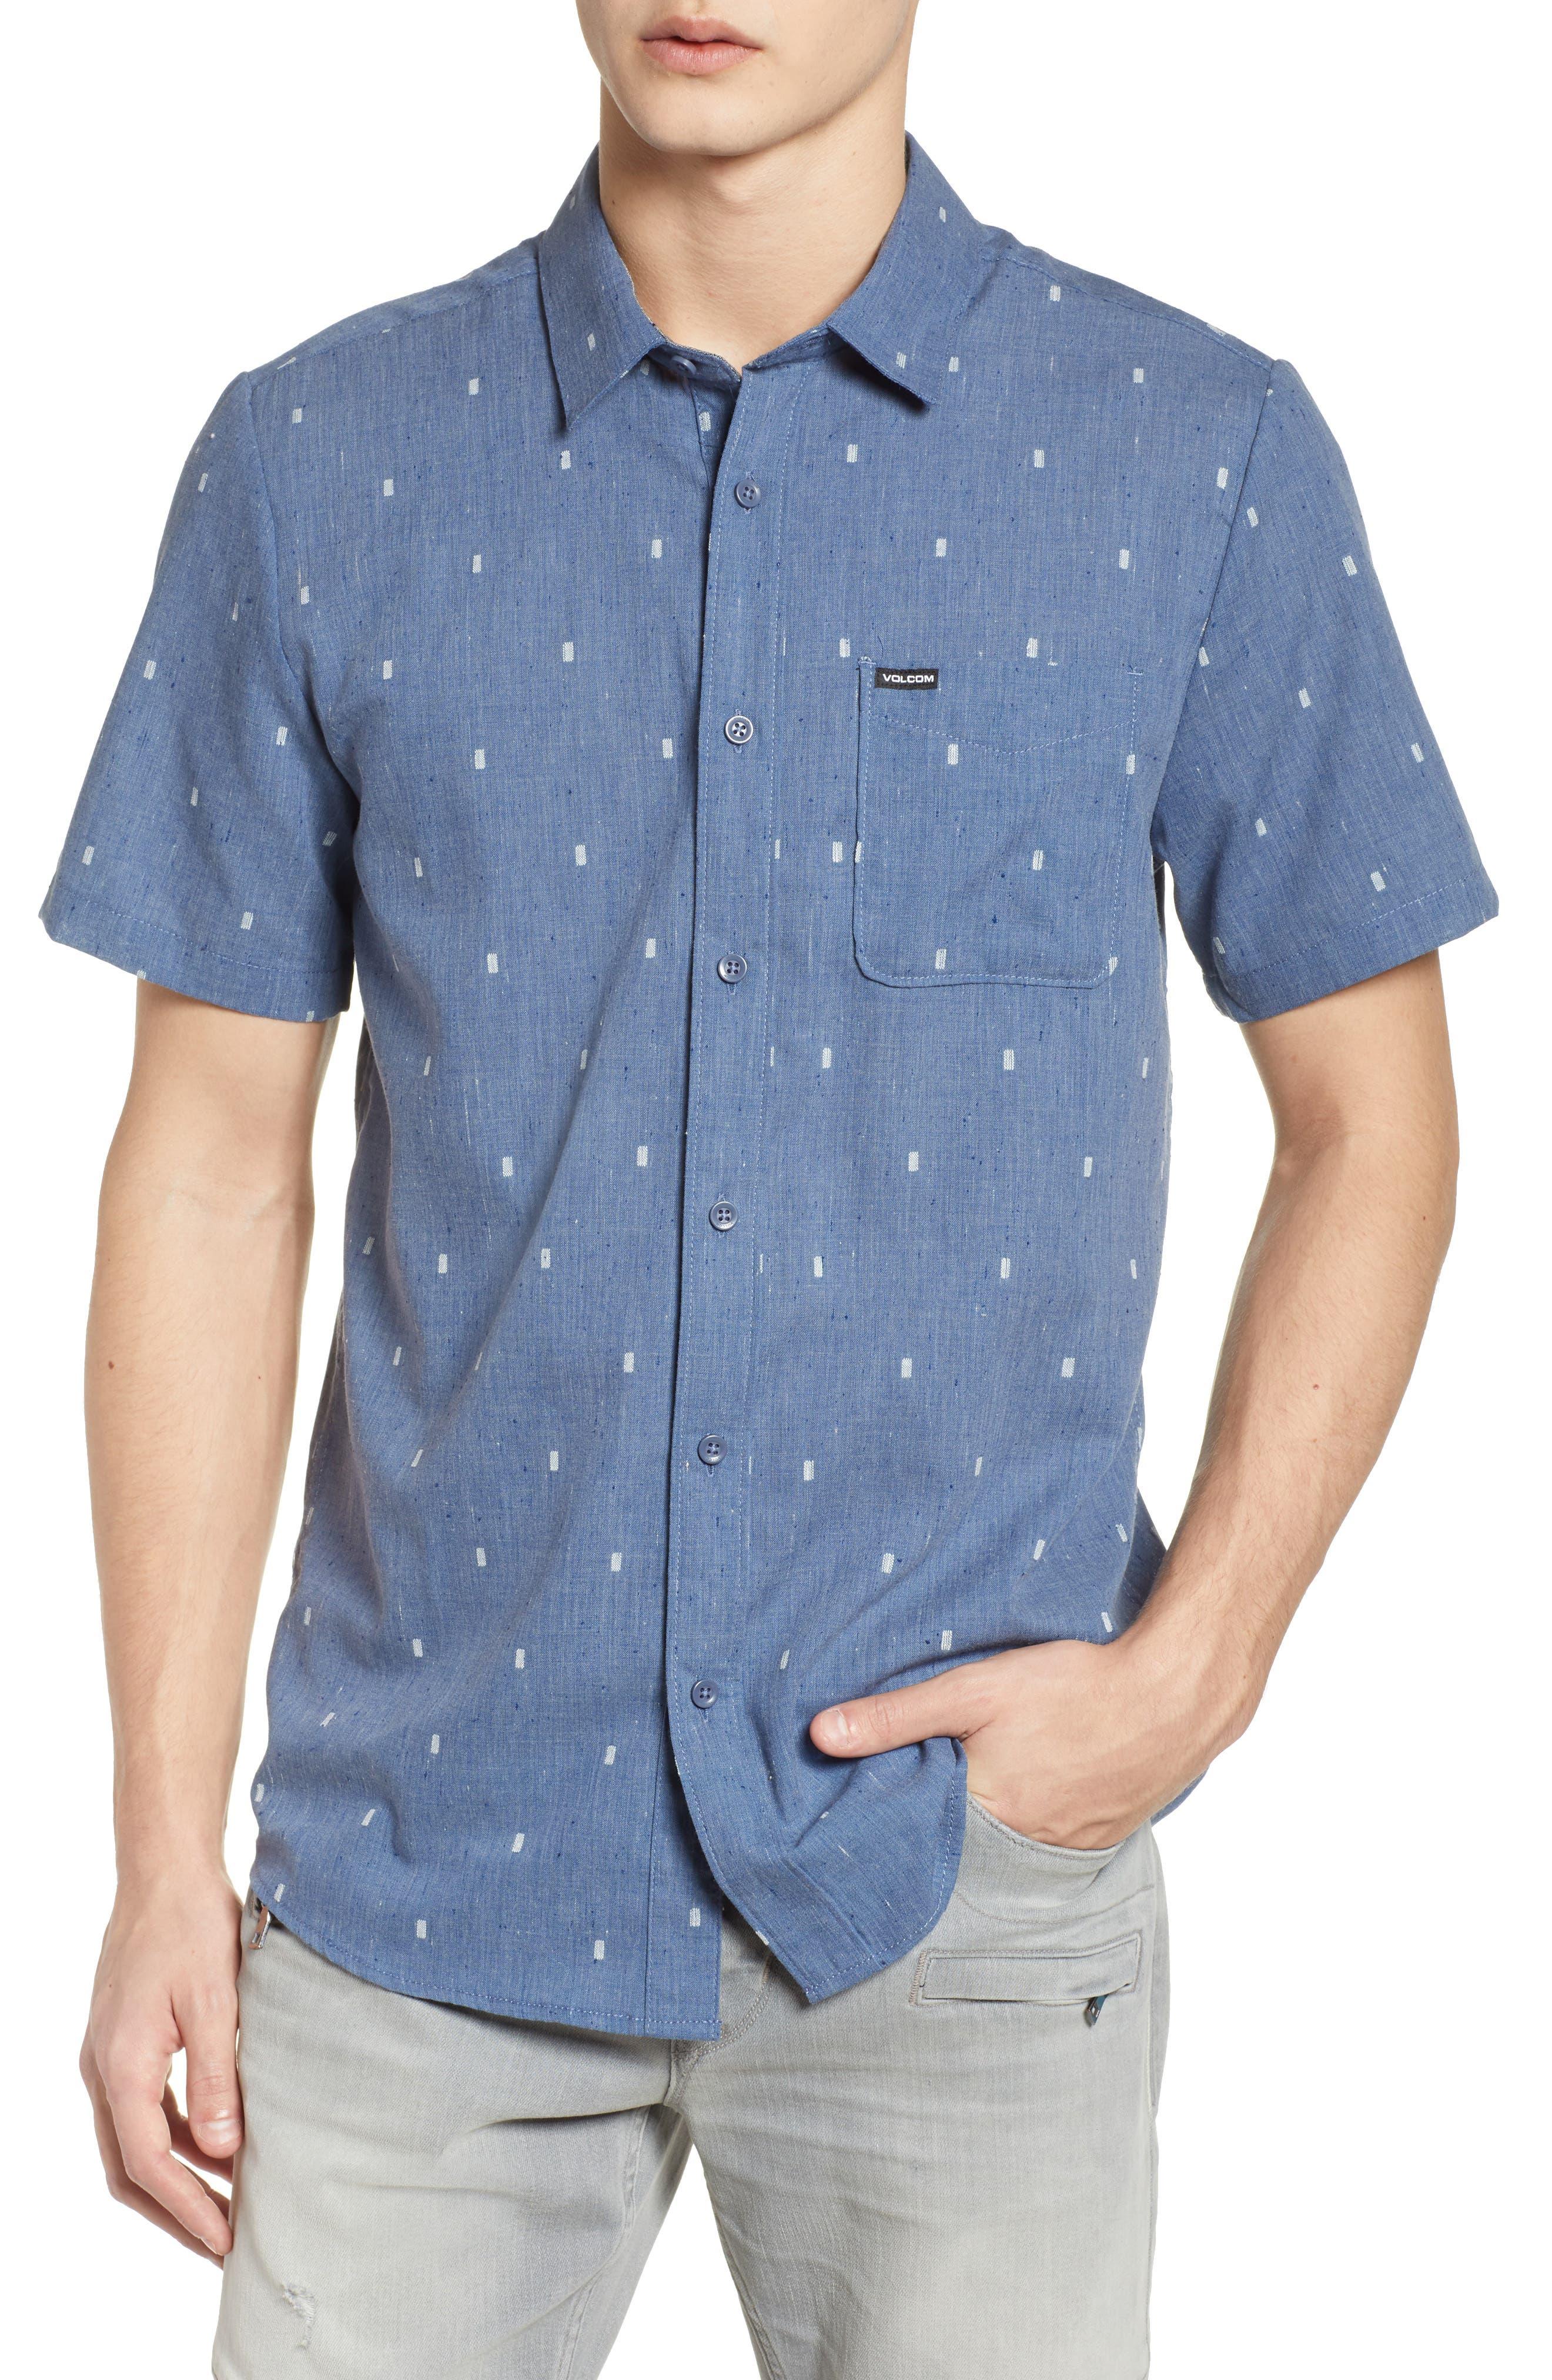 Gladstone Short Sleeve Shirt,                             Main thumbnail 1, color,                             Deep Blue